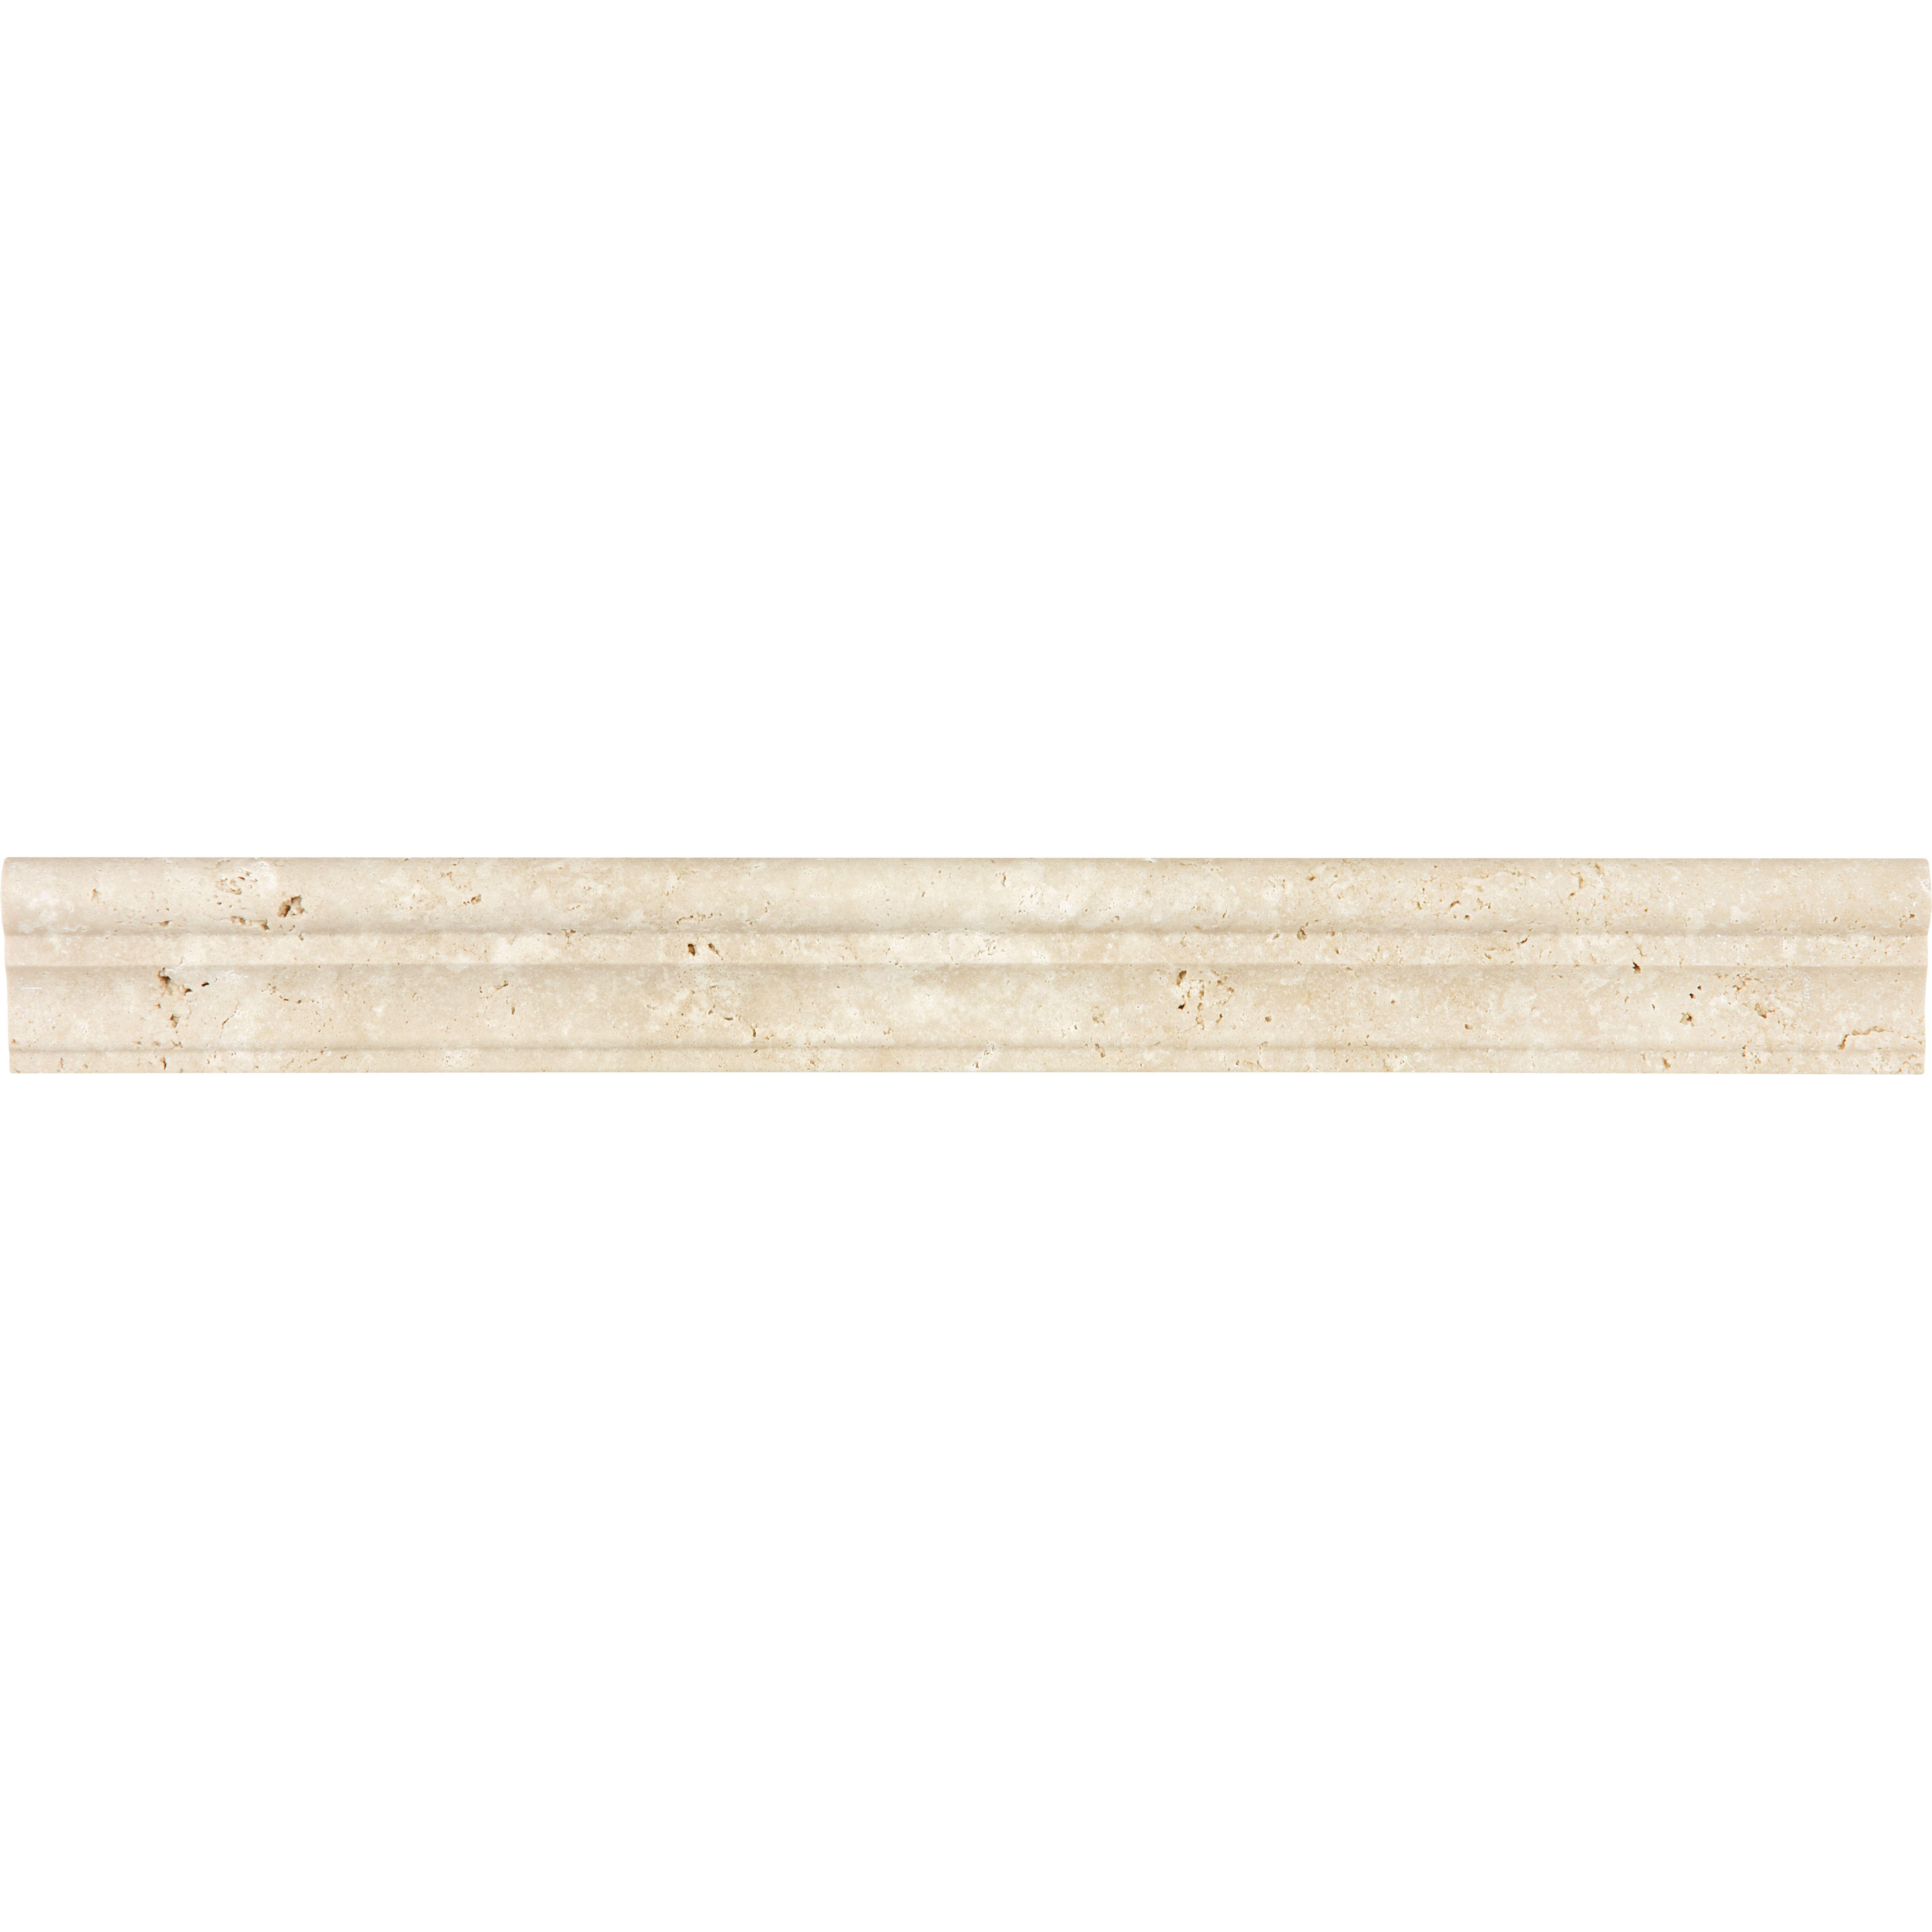 lowes chair rail tile emco fishing anatolia chiaro travertine common 1